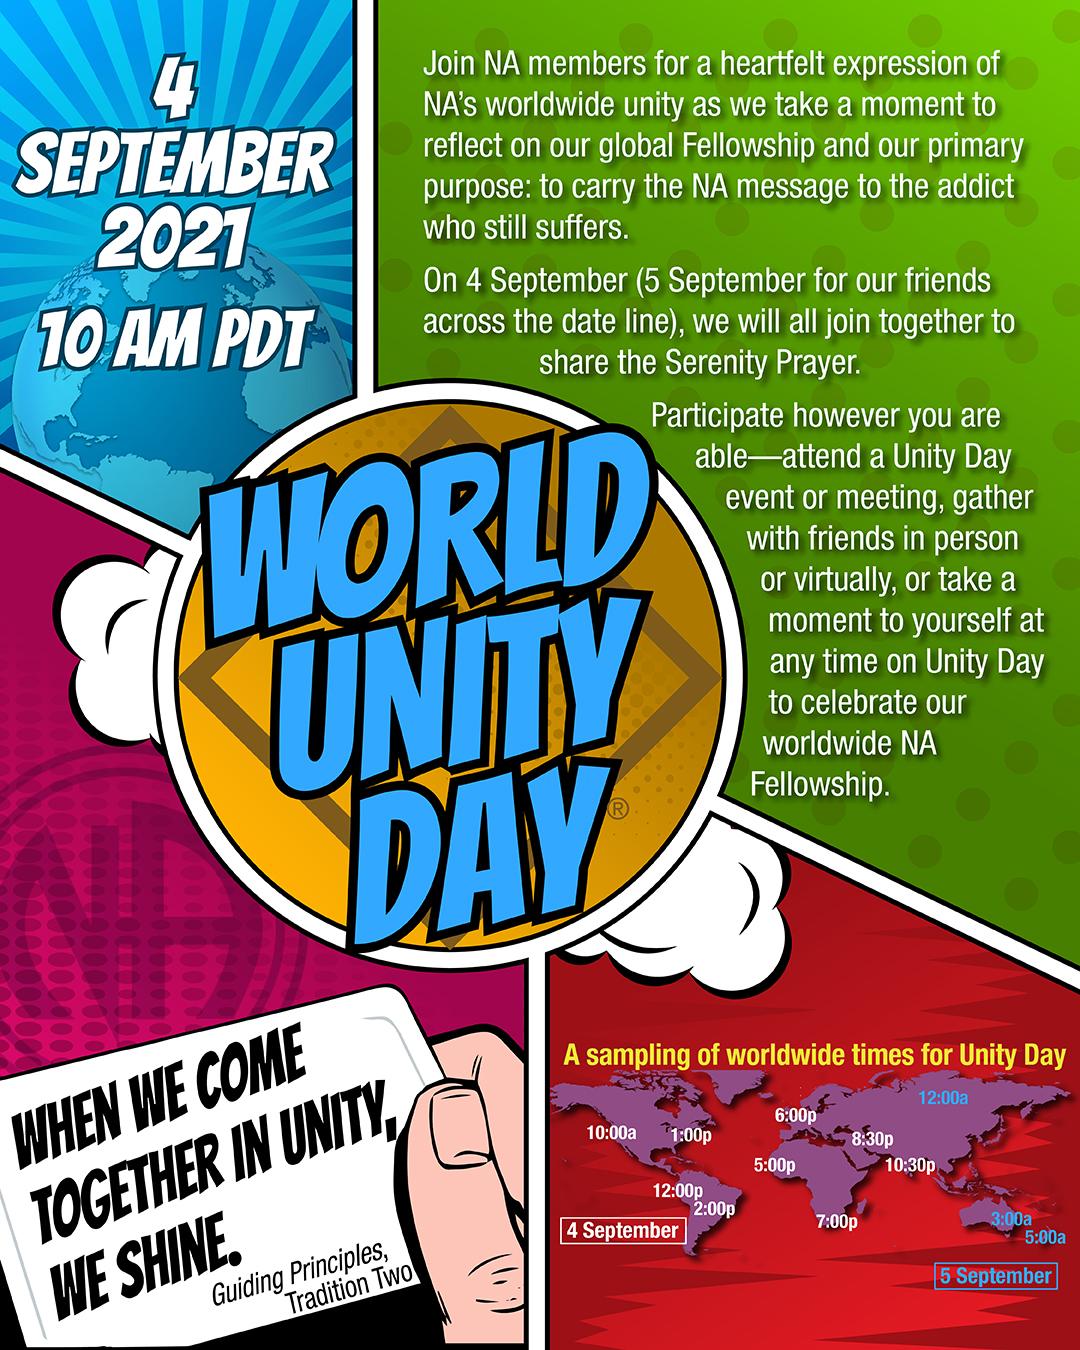 NA World Unity Day